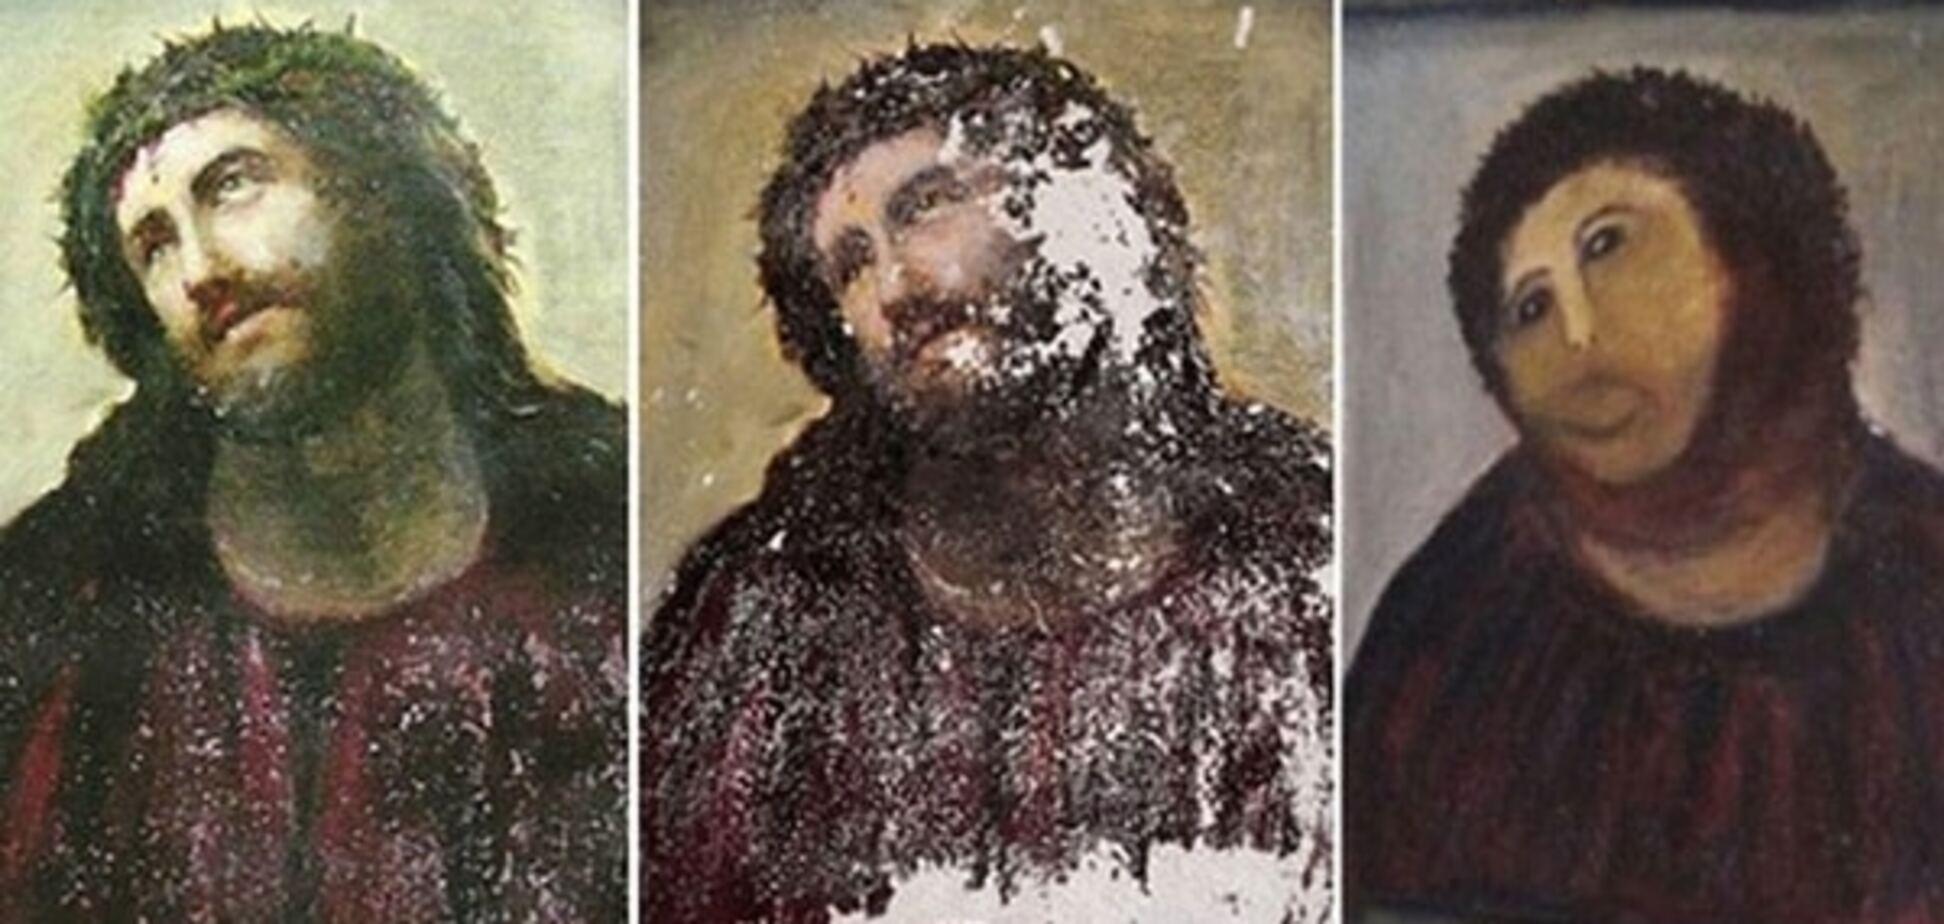 Превратившая Иисуса в посмешище испанка получила шанс разбогатеть